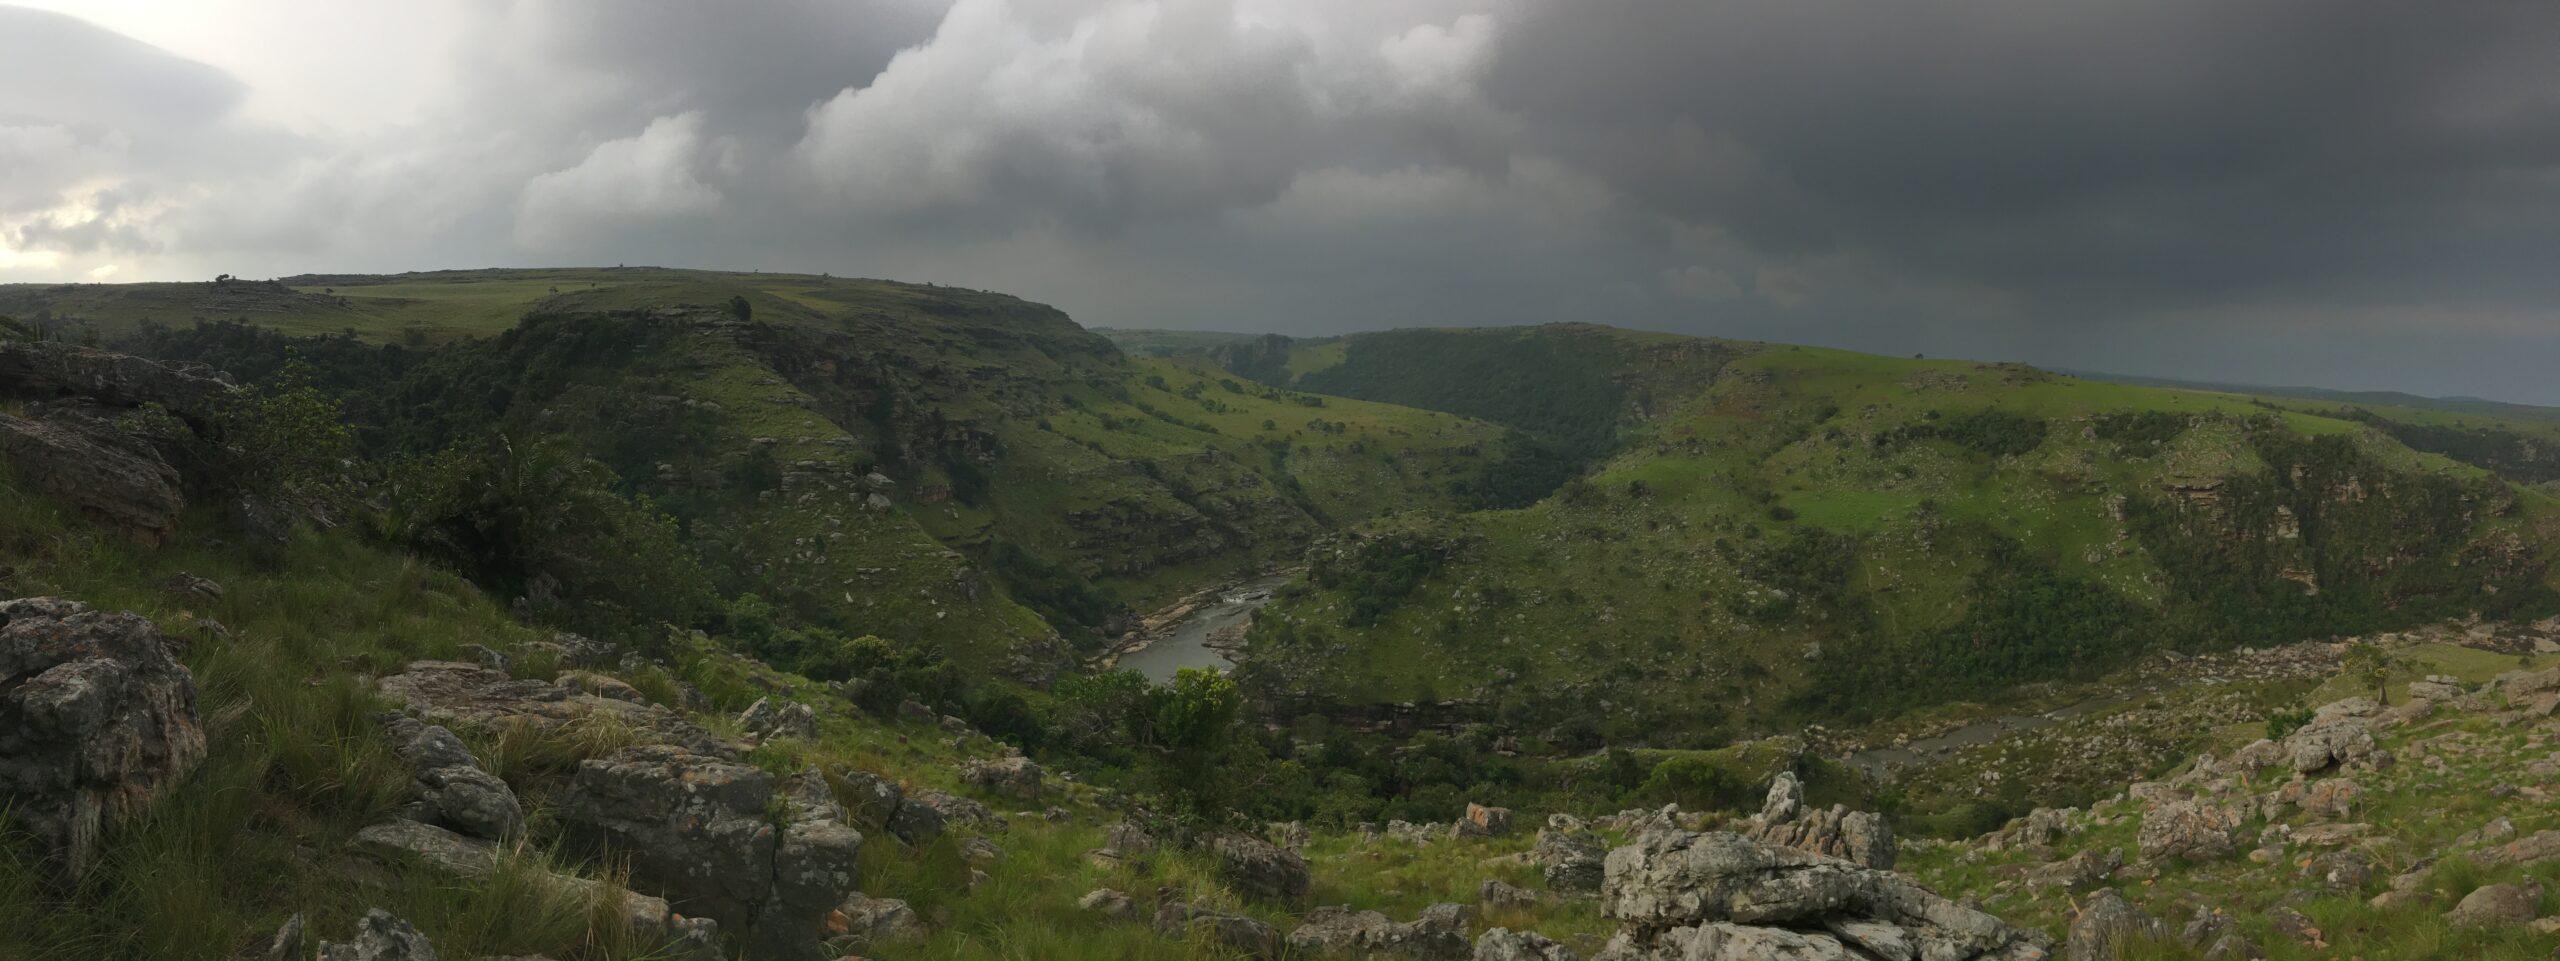 Pondoland, Sydafrika, Skog, Globala, Reportage